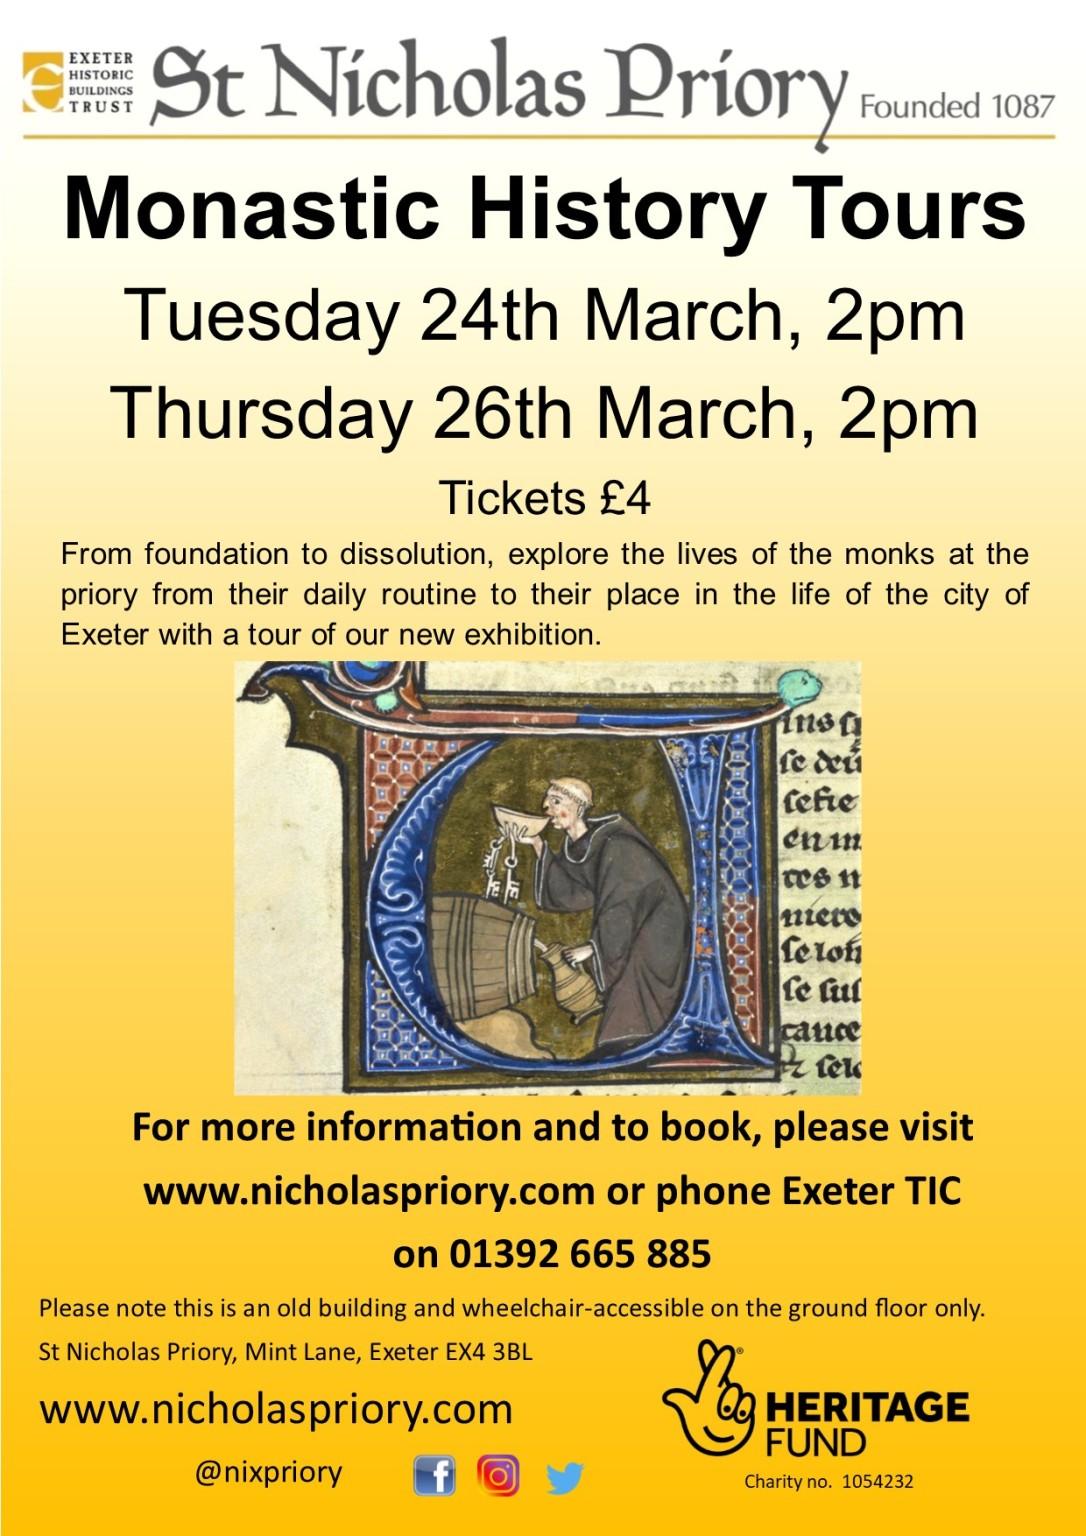 Monastic History Tours Mar20